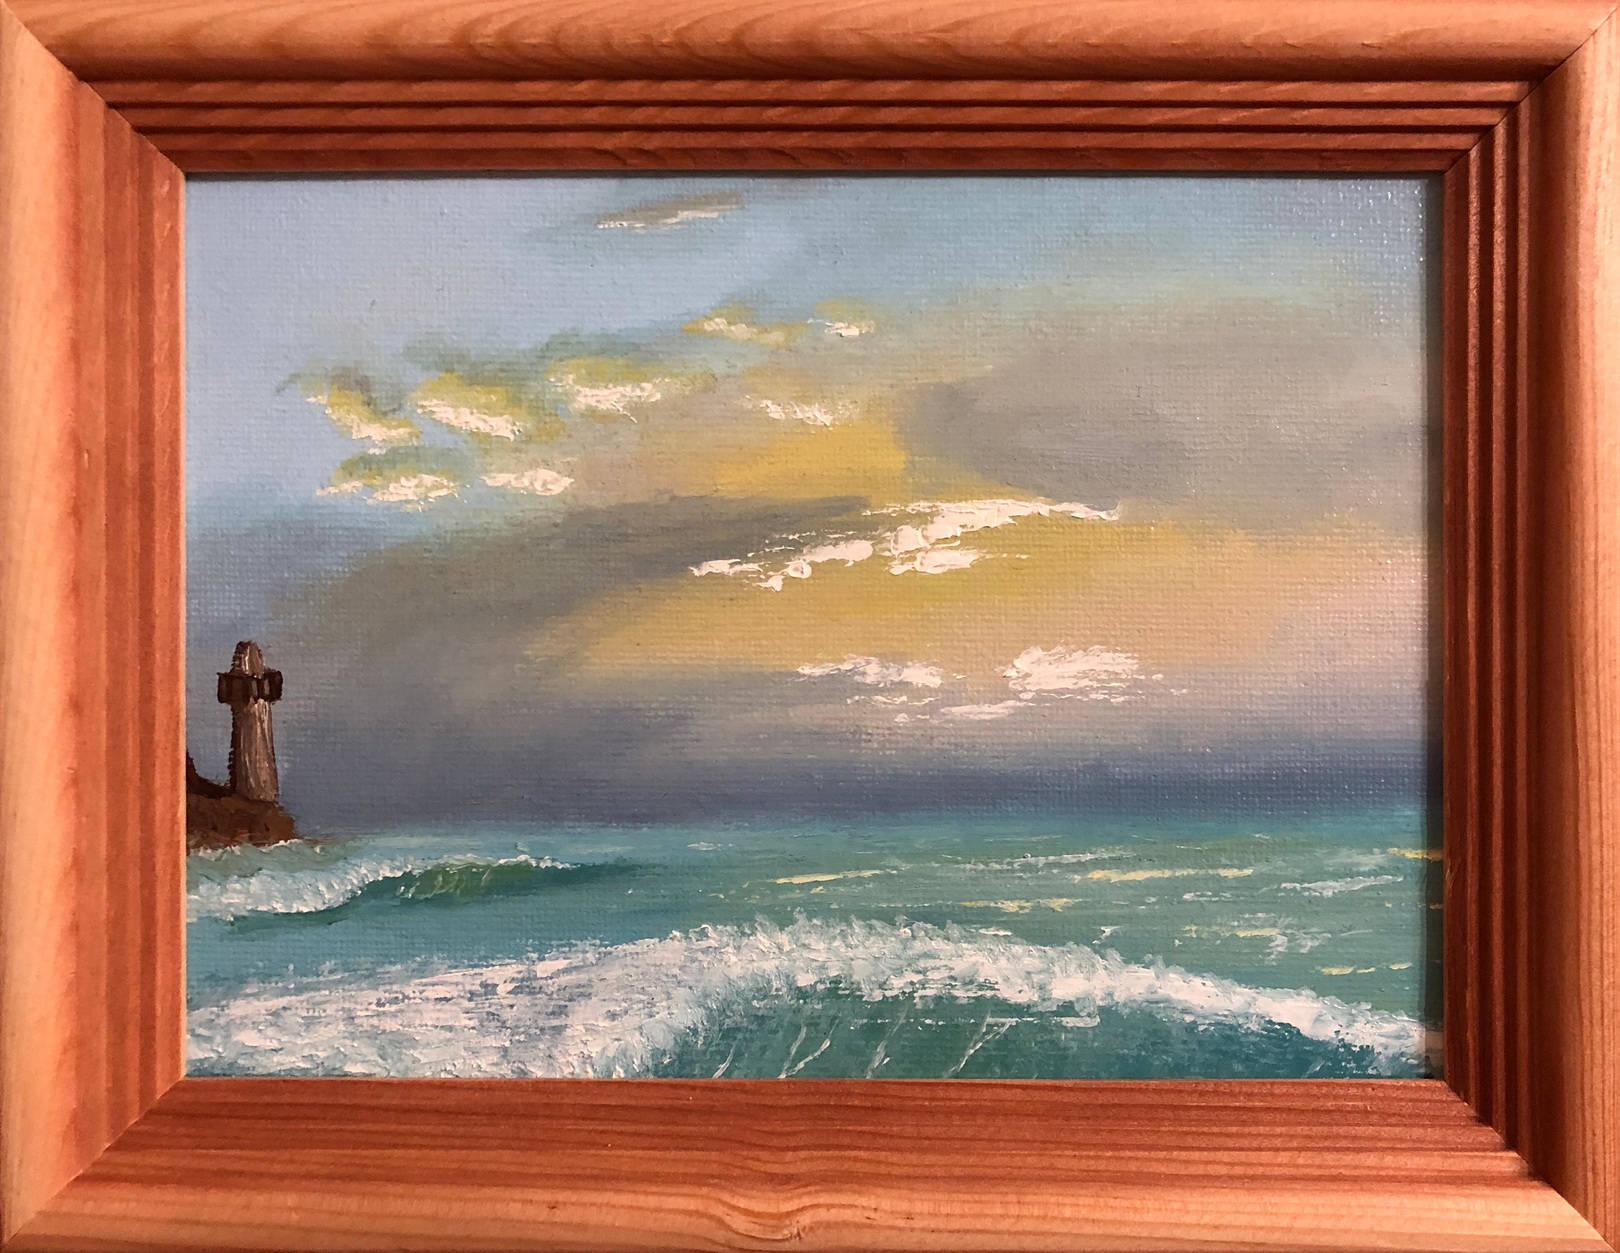 Sea (18x24)